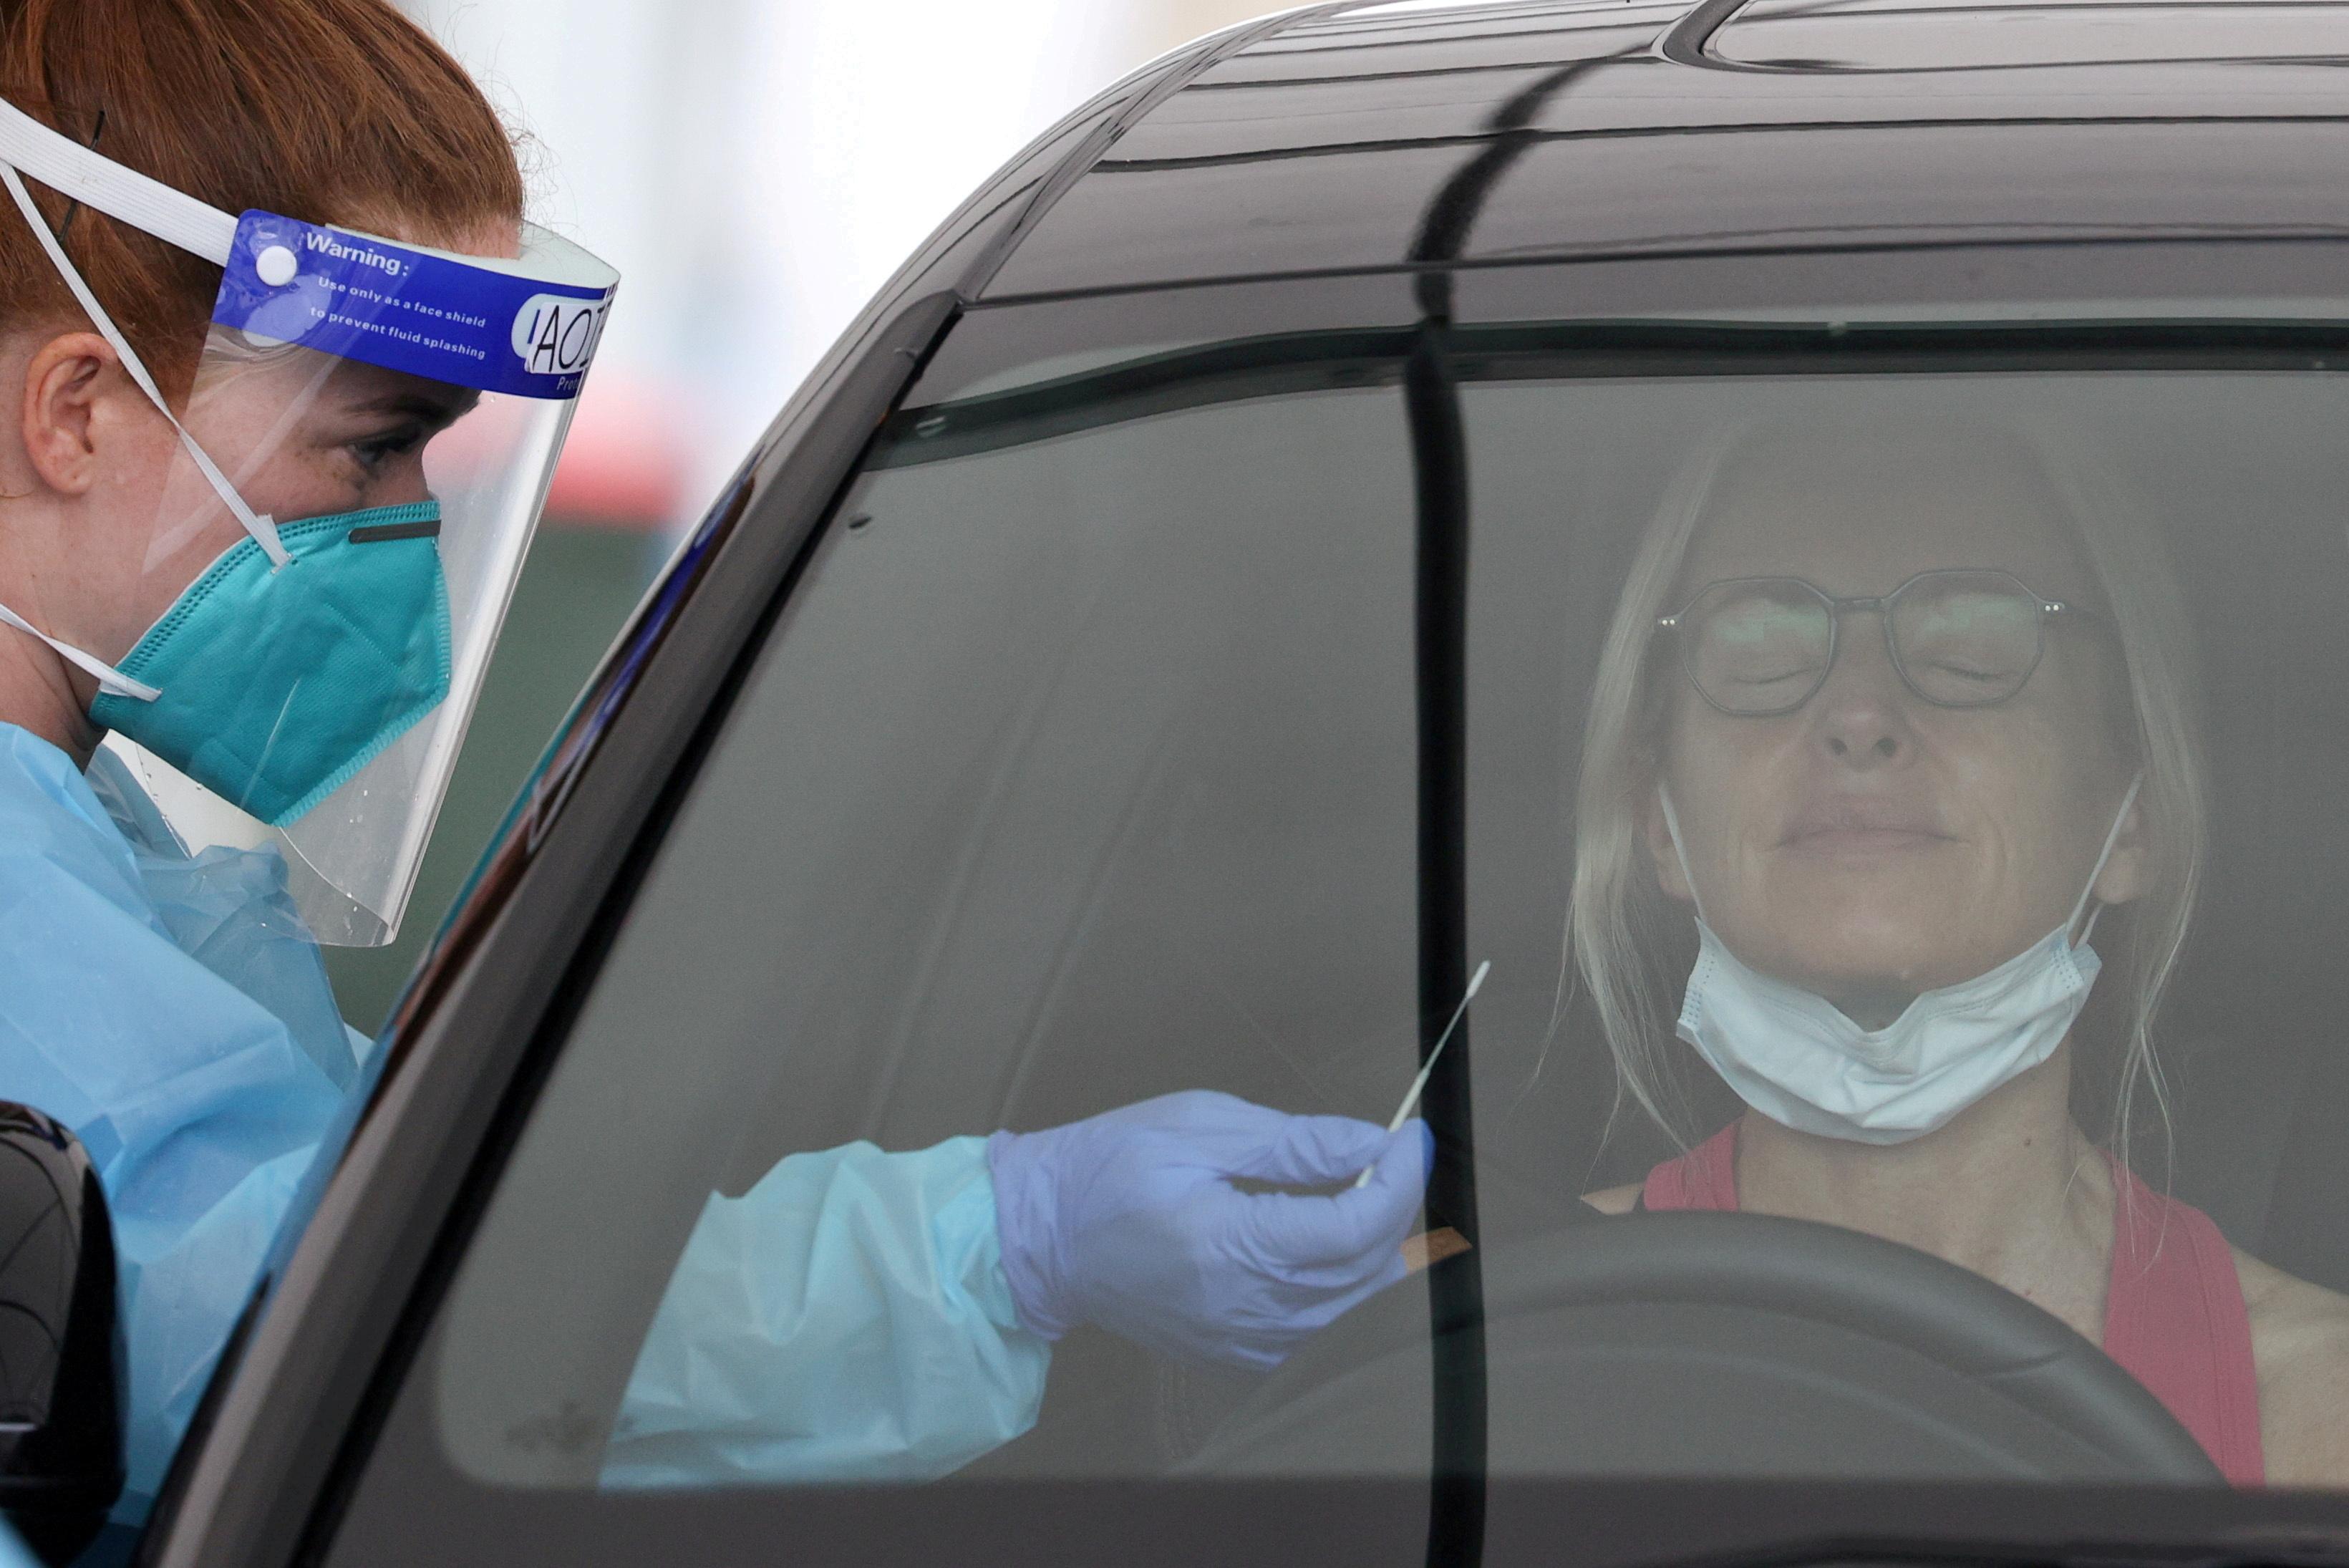 A medical worker swabs a member of the public at the Bondi Beach drive-through coronavirus disease (COVID-19) testing centre as the city experiences an outbreak in Sydney, Australia, December 21, 2020. REUTERS/Loren Elliott